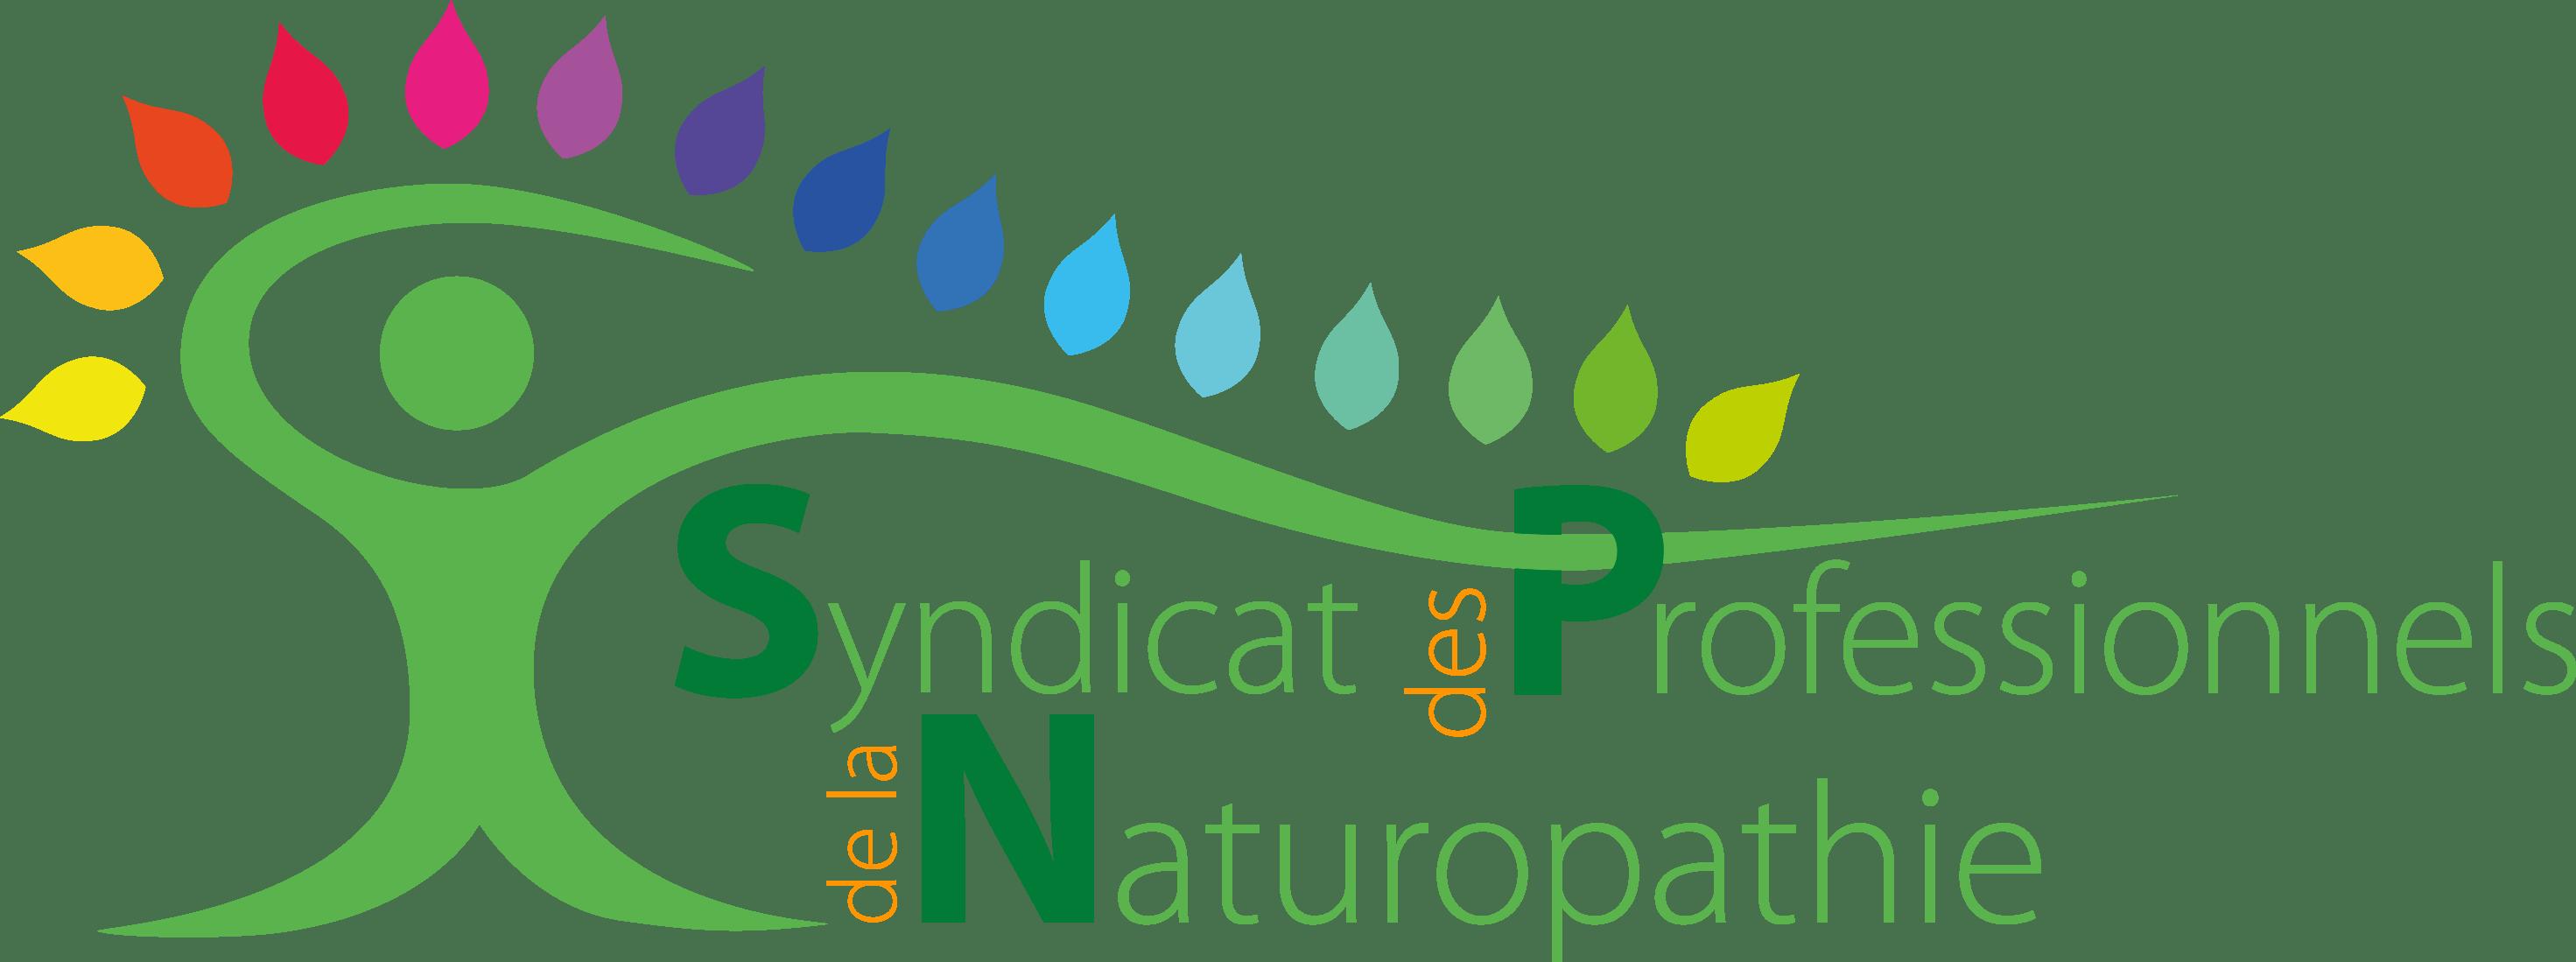 logosyndicatprofessionnelsnaturopathie